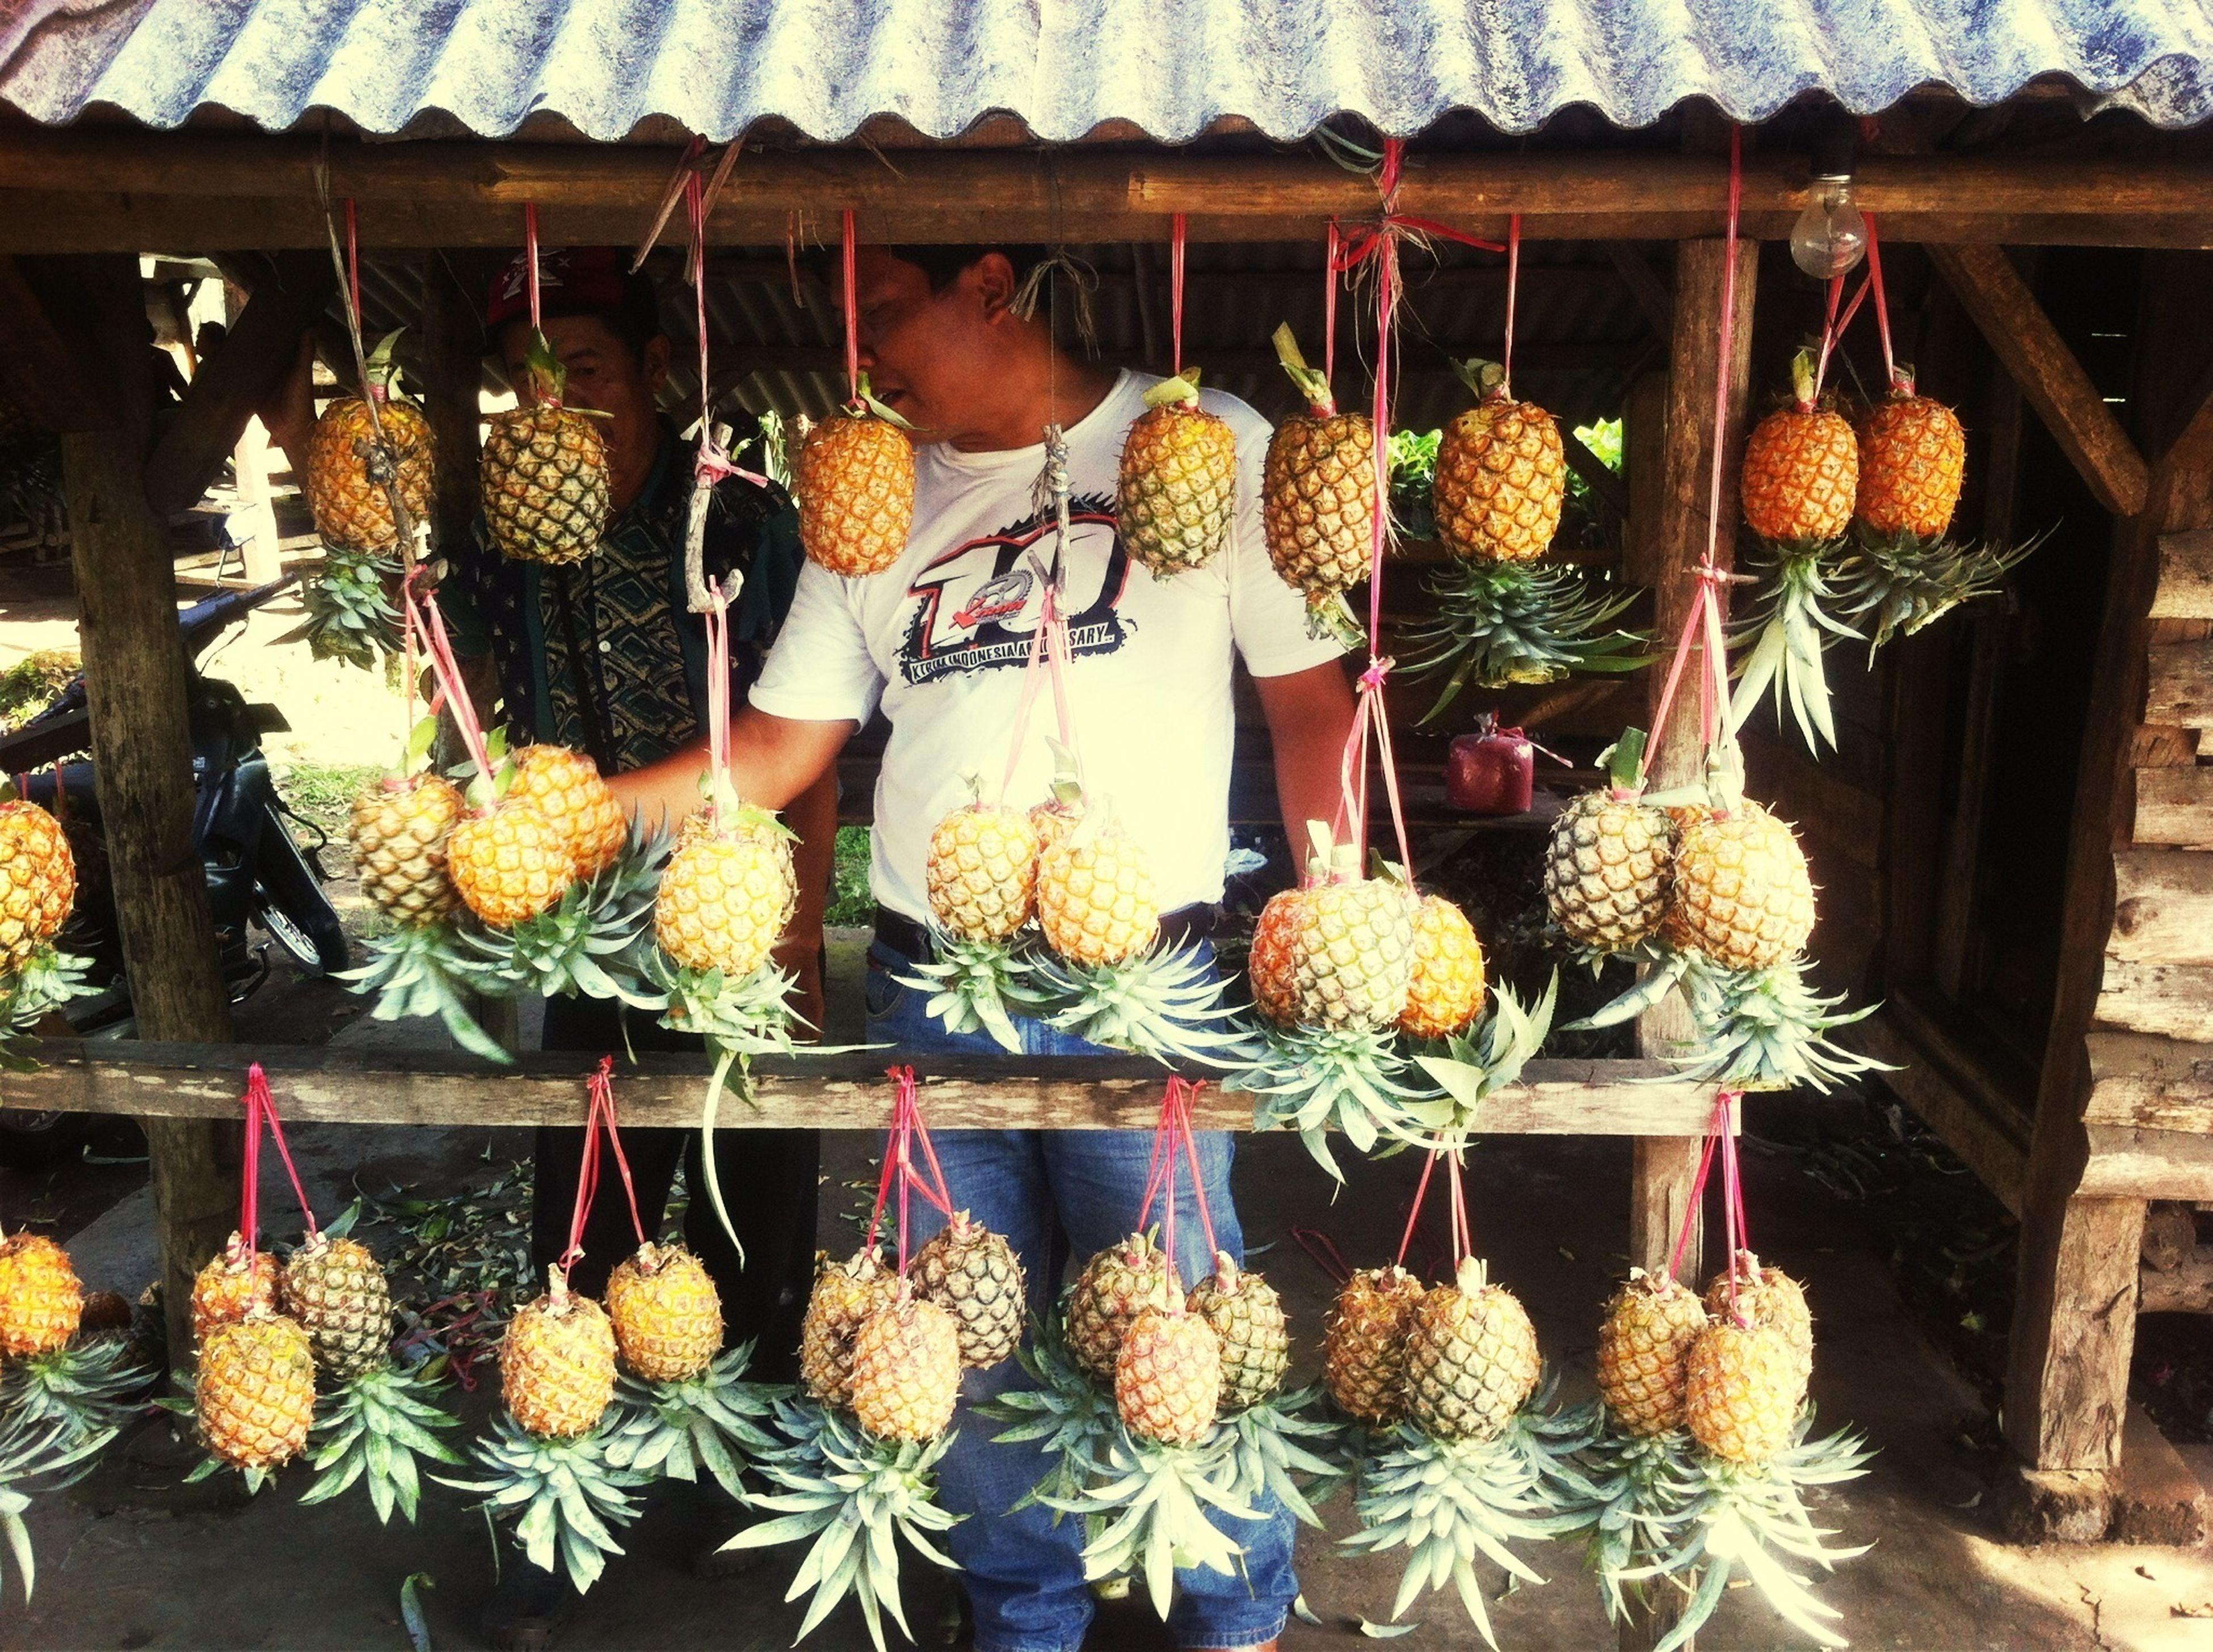 for sale, retail, freshness, abundance, market stall, market, variation, food, large group of objects, food and drink, choice, healthy eating, fruit, flower, basket, hanging, arrangement, display, vegetable, agriculture